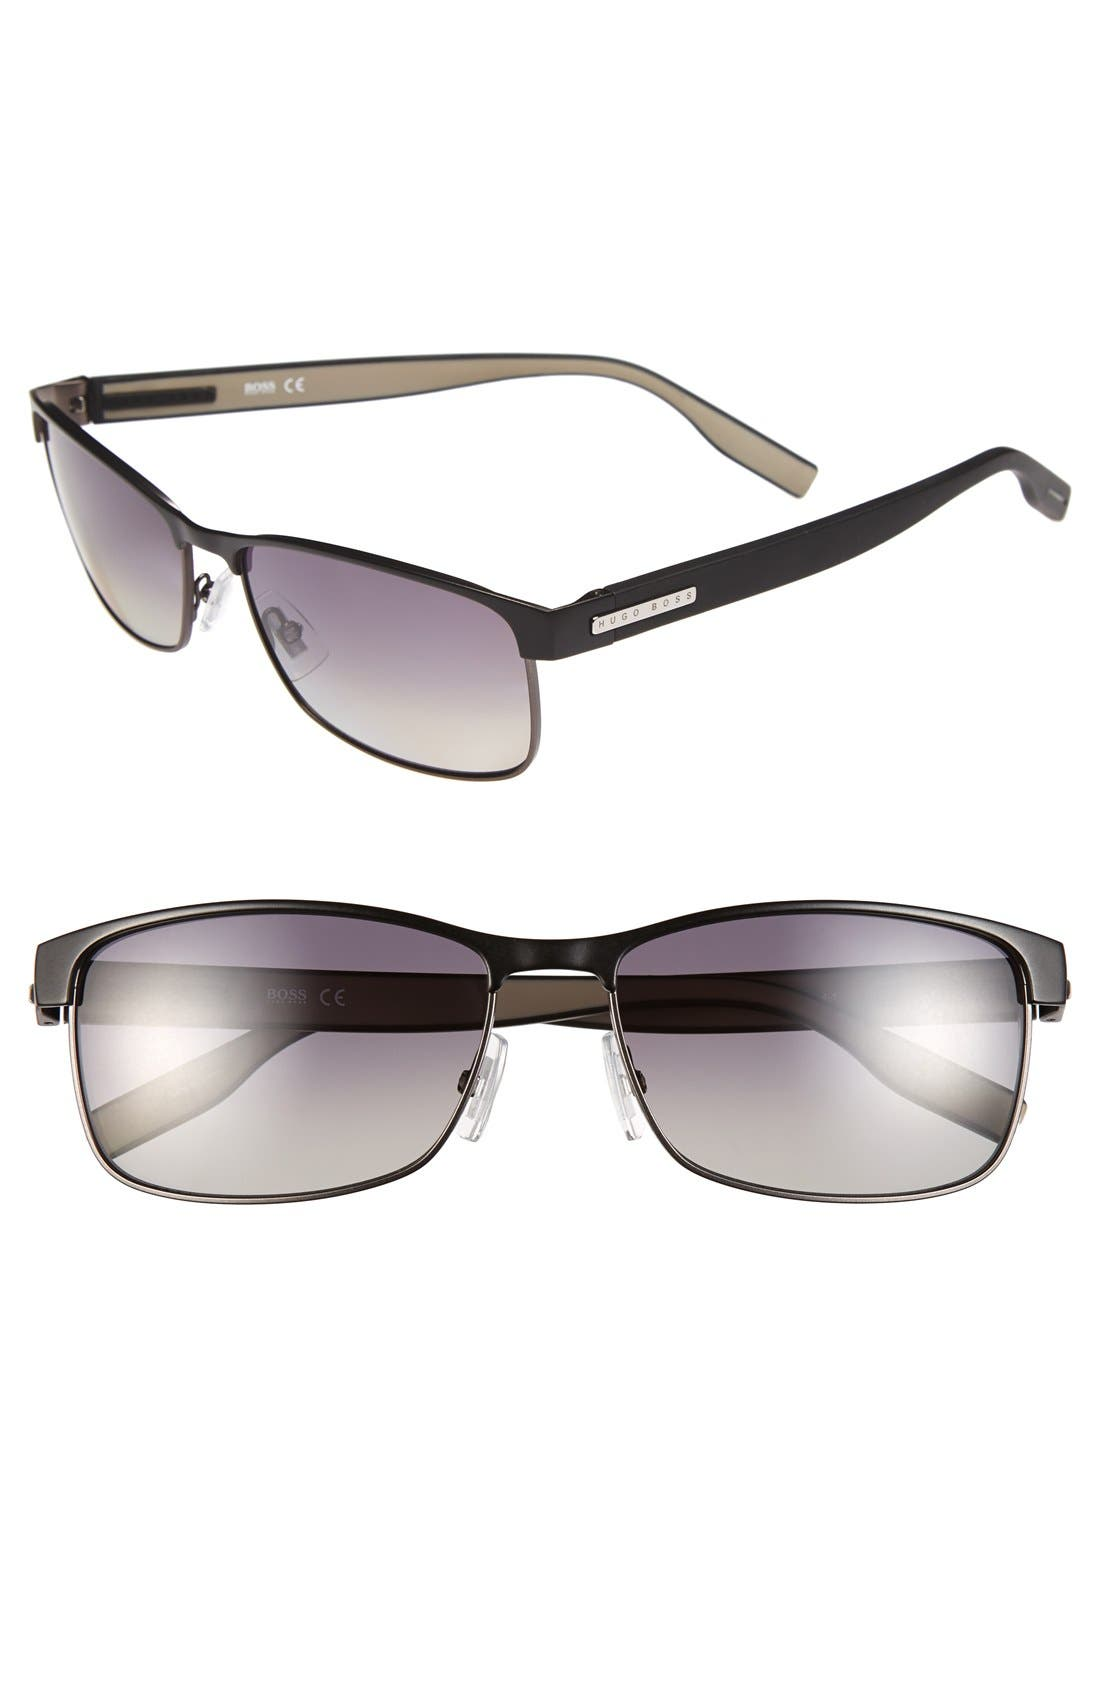 Main Image - BOSS 58mm Polarized Sunglasses